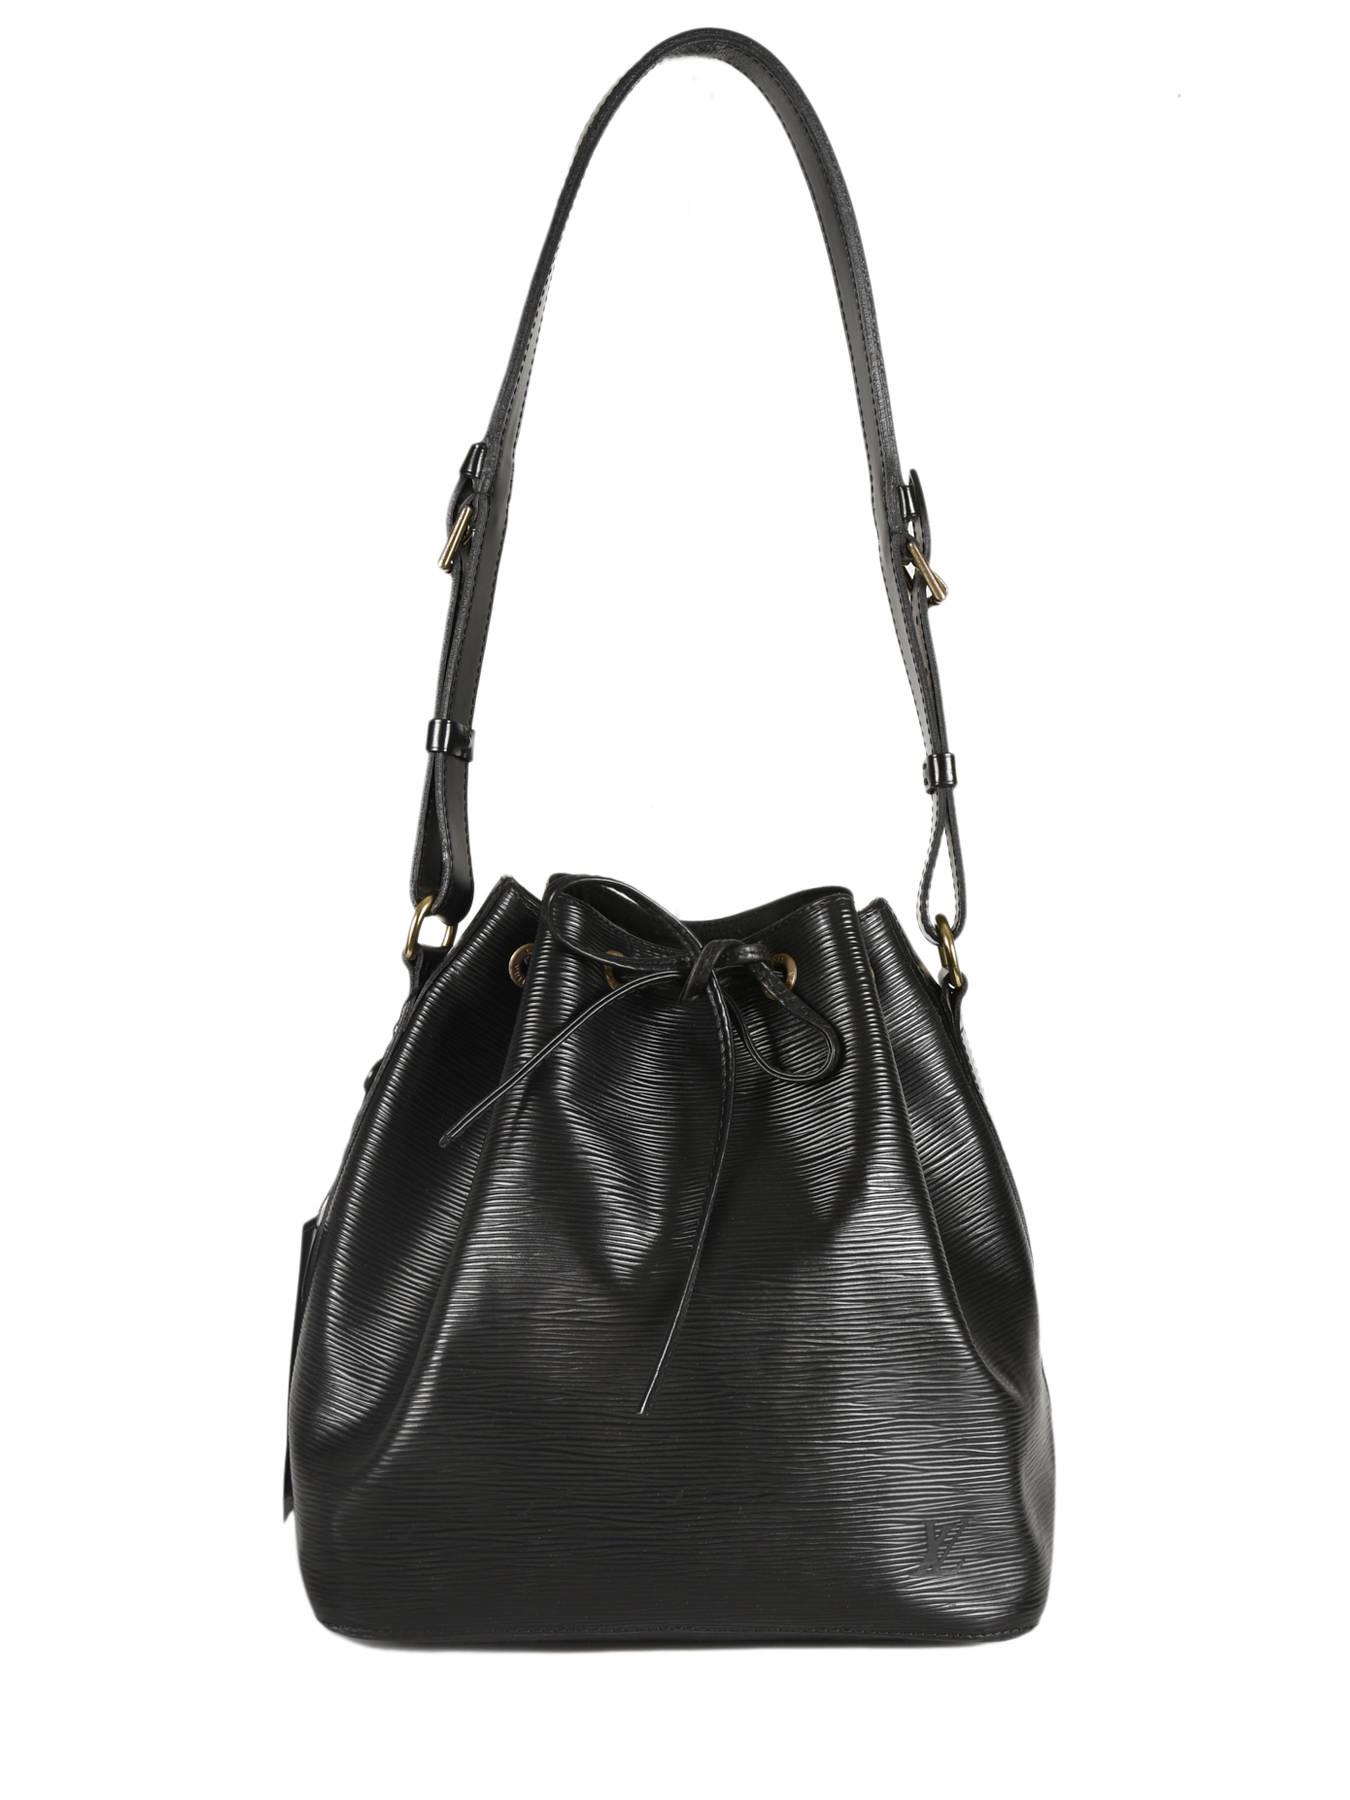 ... Preloved Louis Vuitton Bucket Bag Noé Brand connection Black louis  vuitton 181 ... 45b63403b